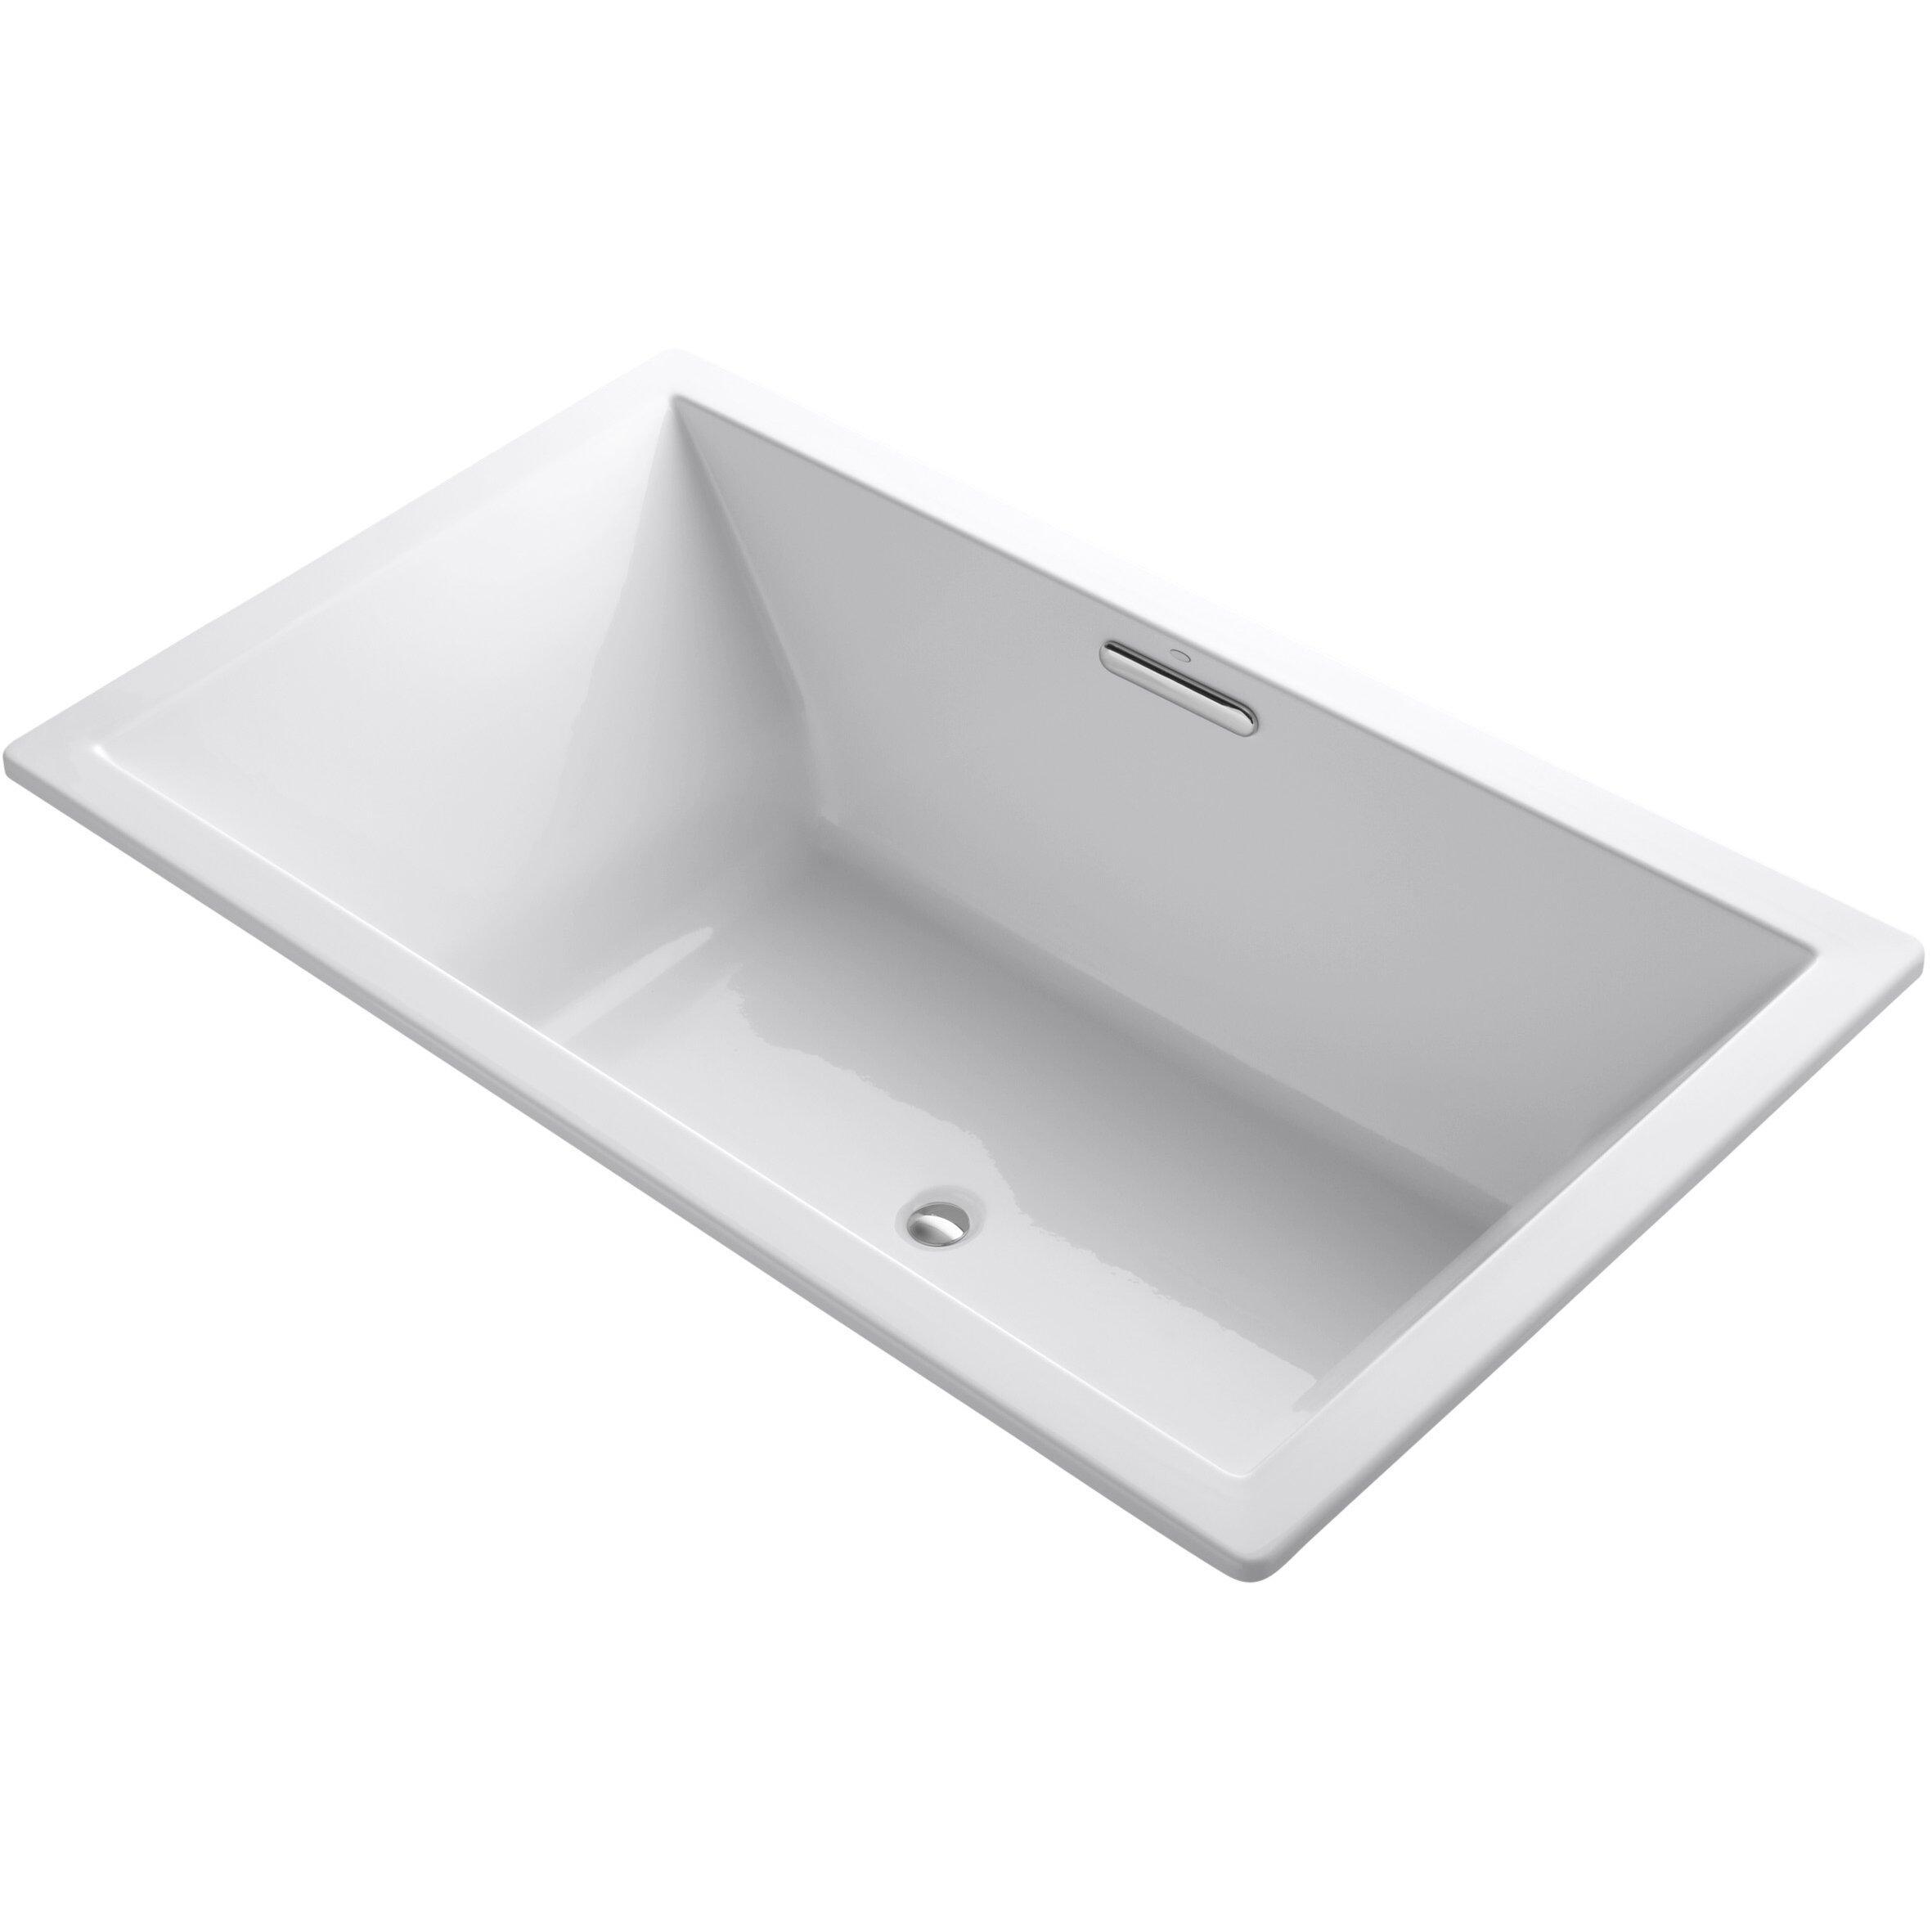 Bathtub Kohler : Underscore 72